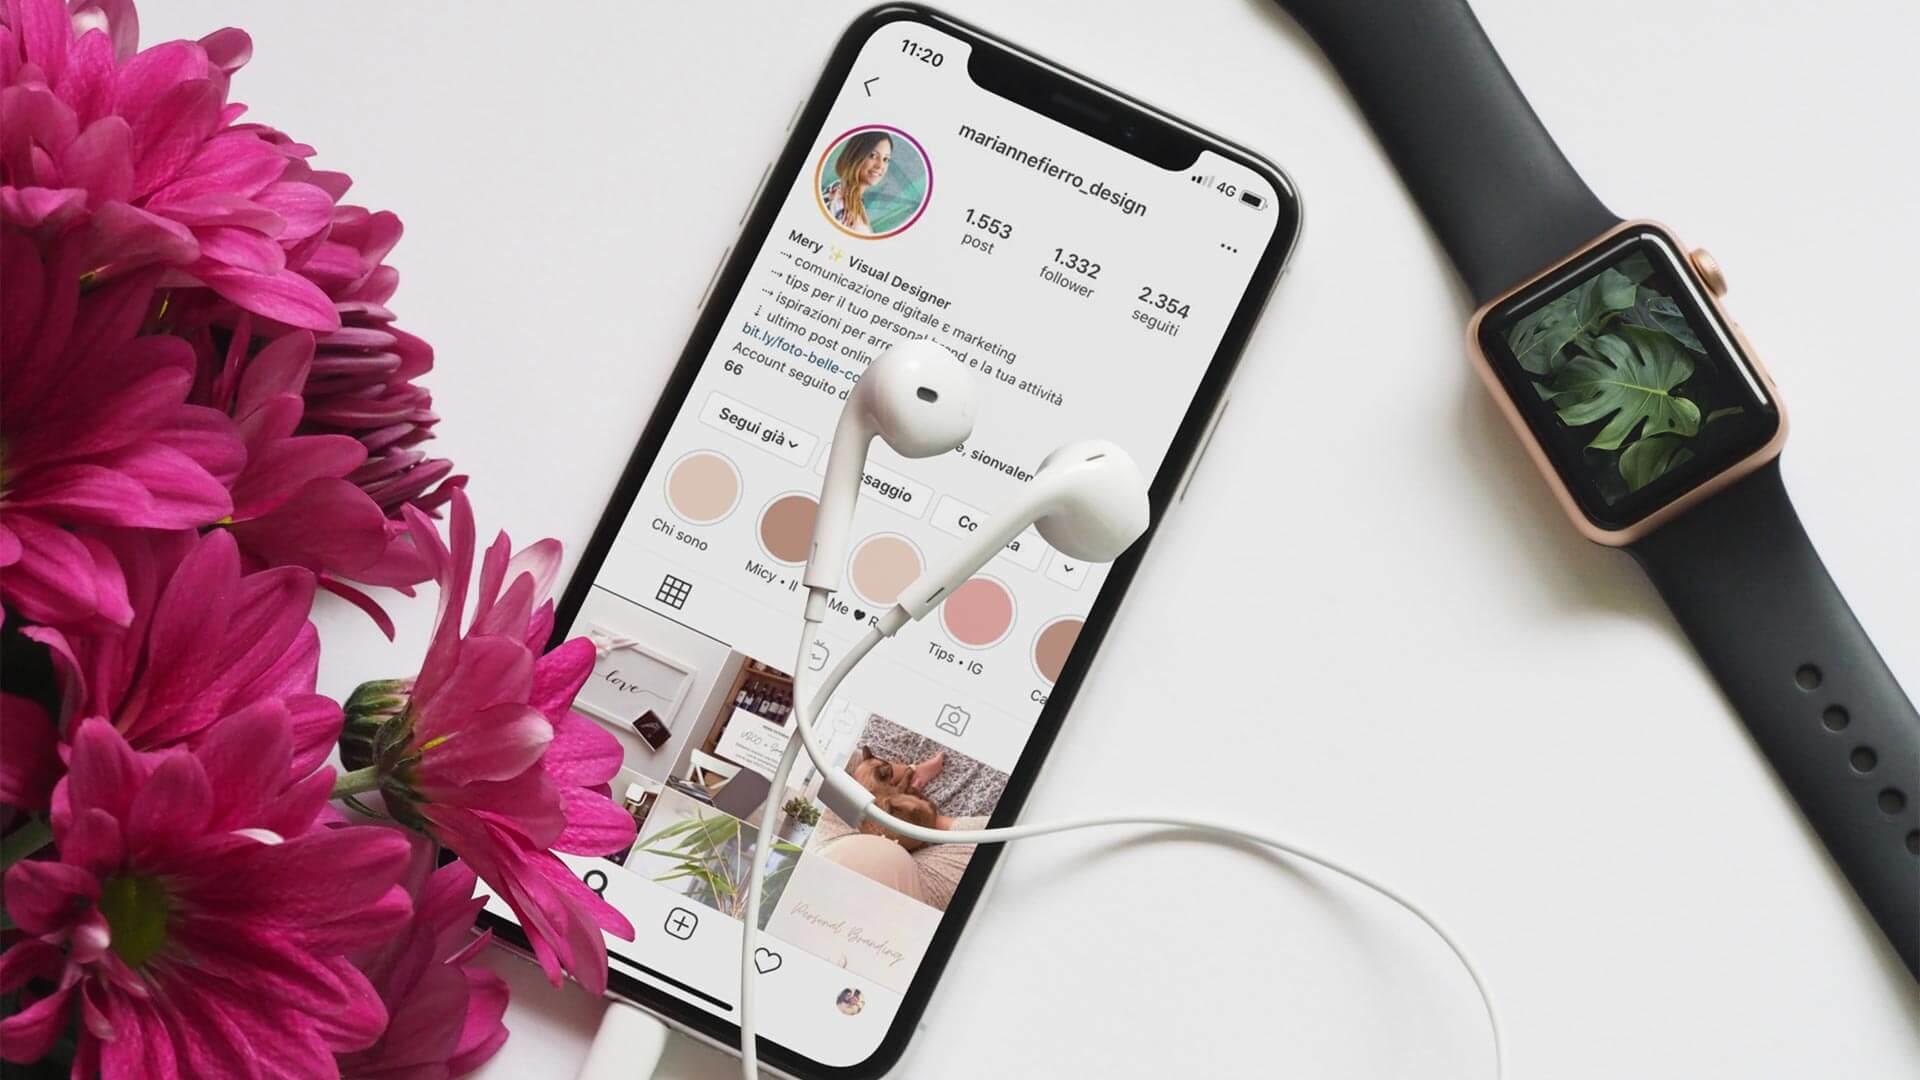 Gestire Instagram per promuoversi non è gratis